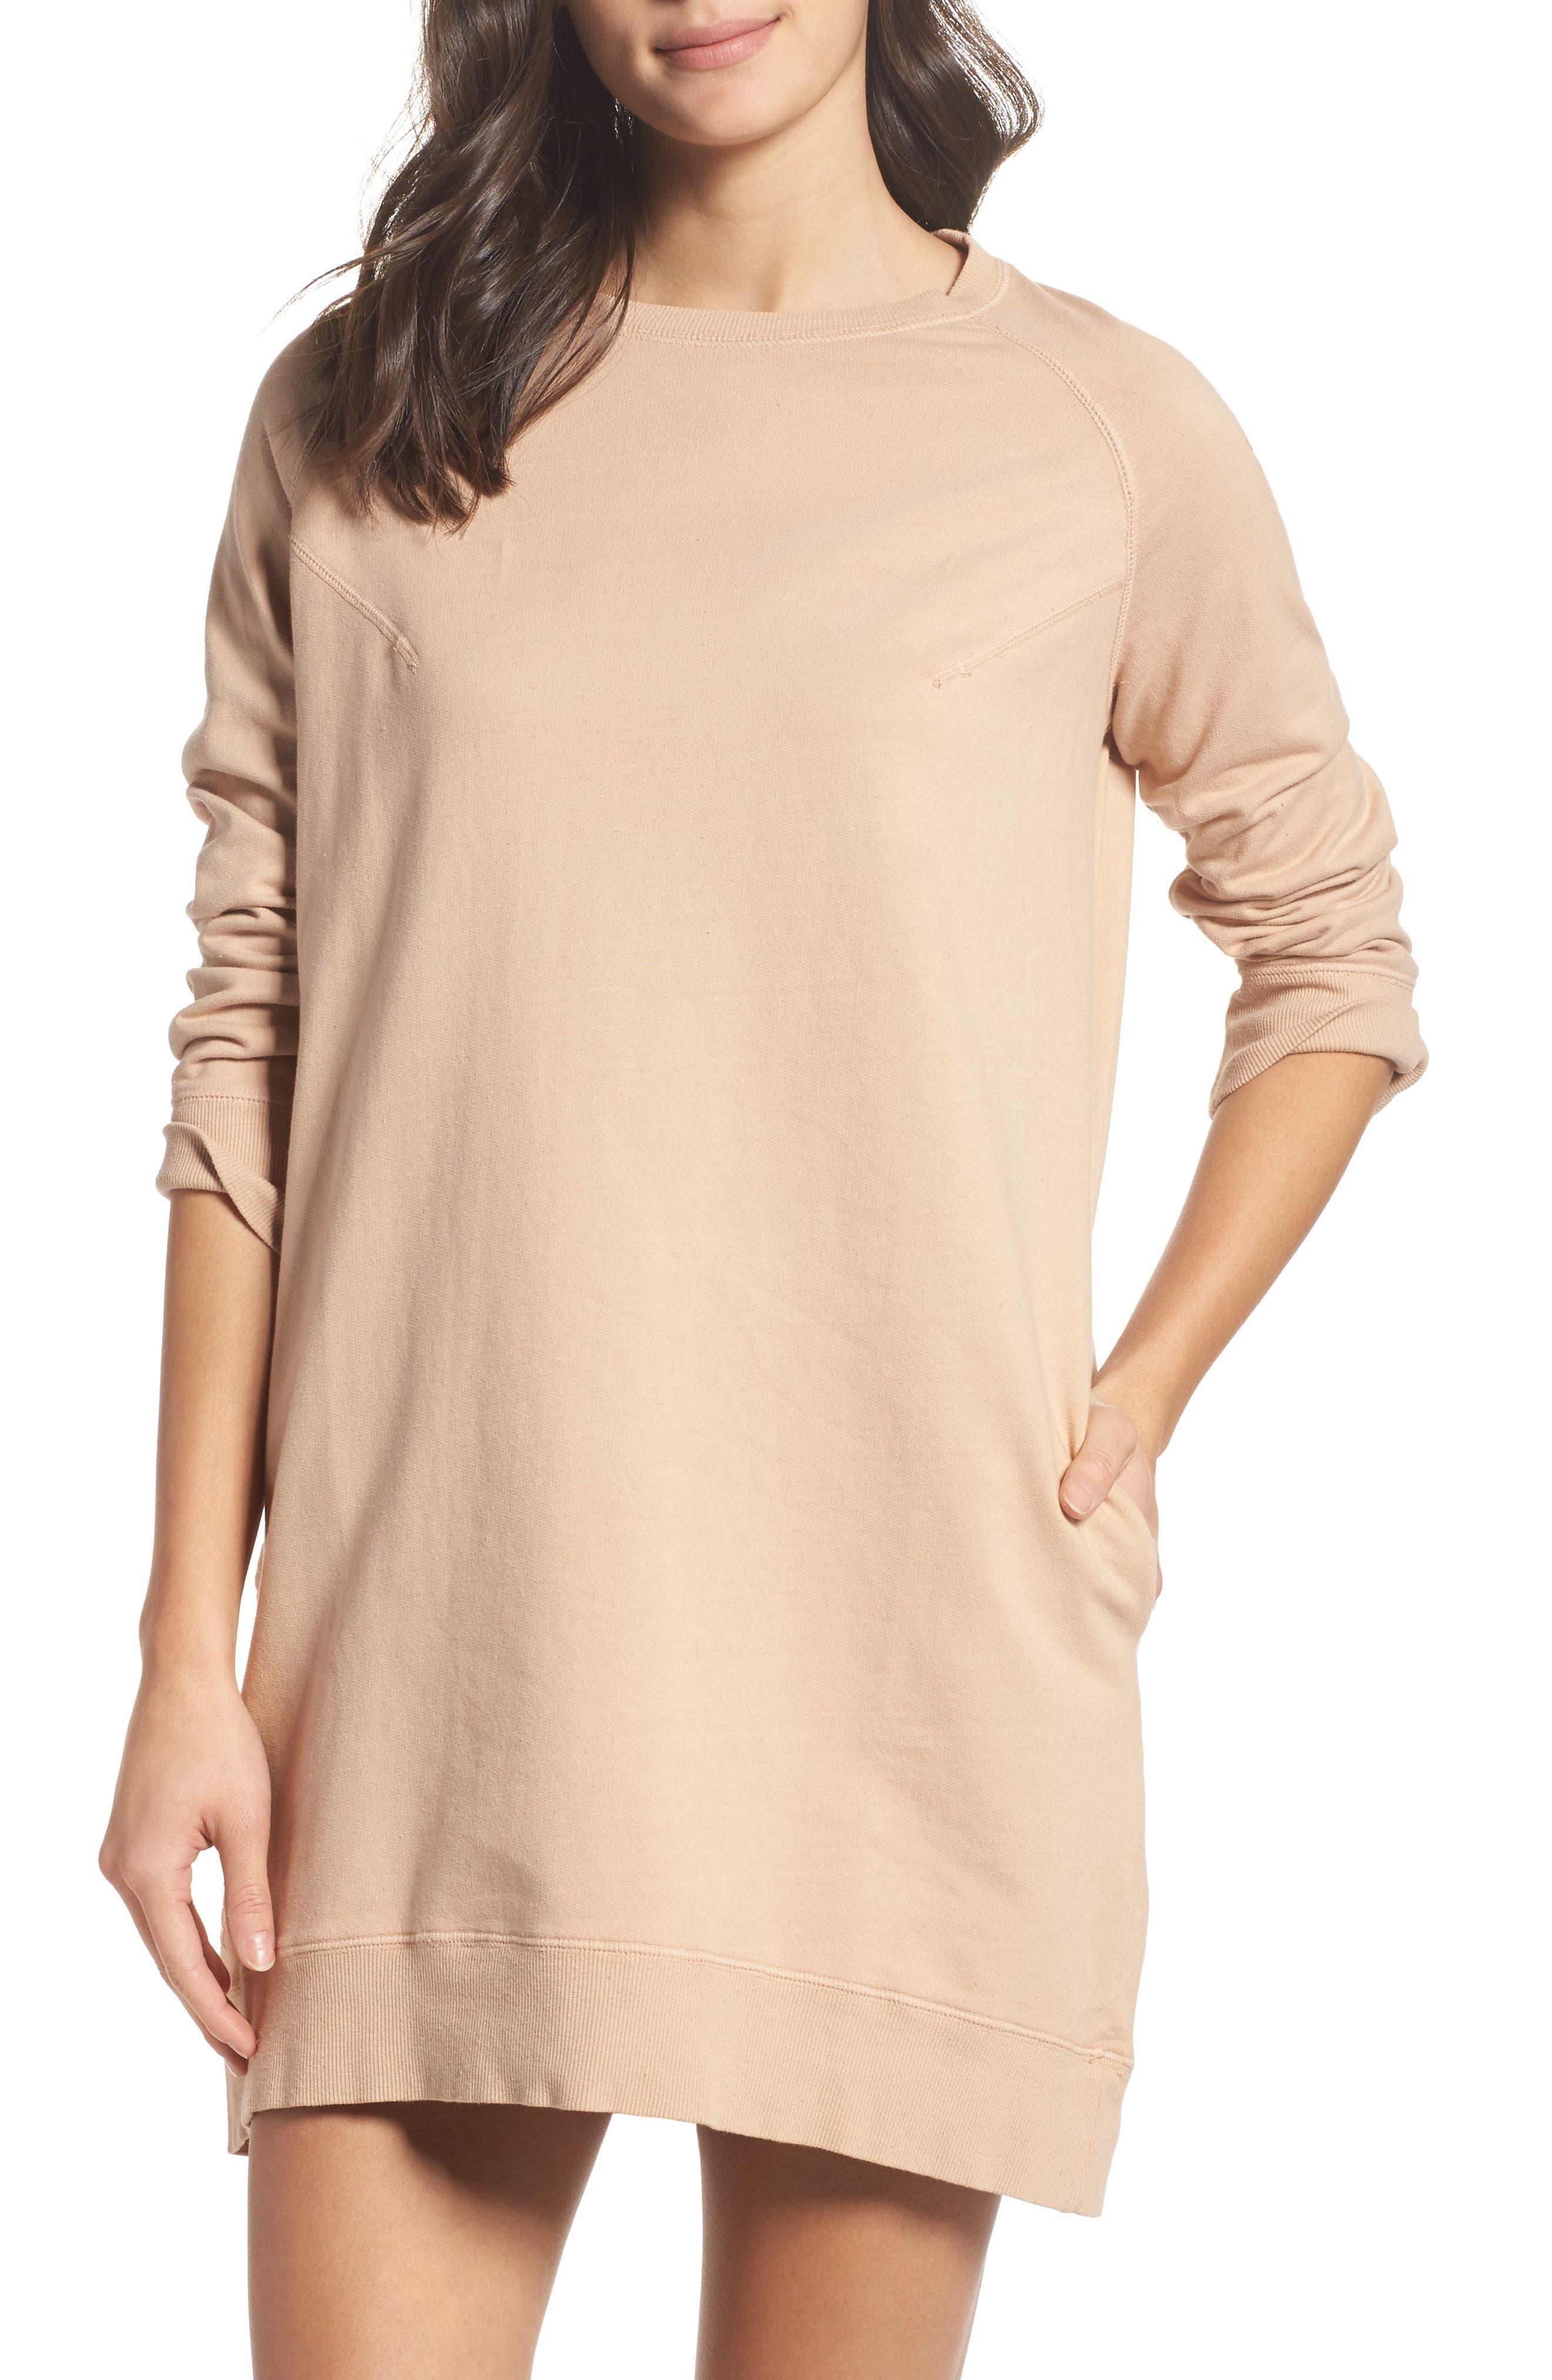 Sweatshirt Dress,                         Main,                         color, Nude